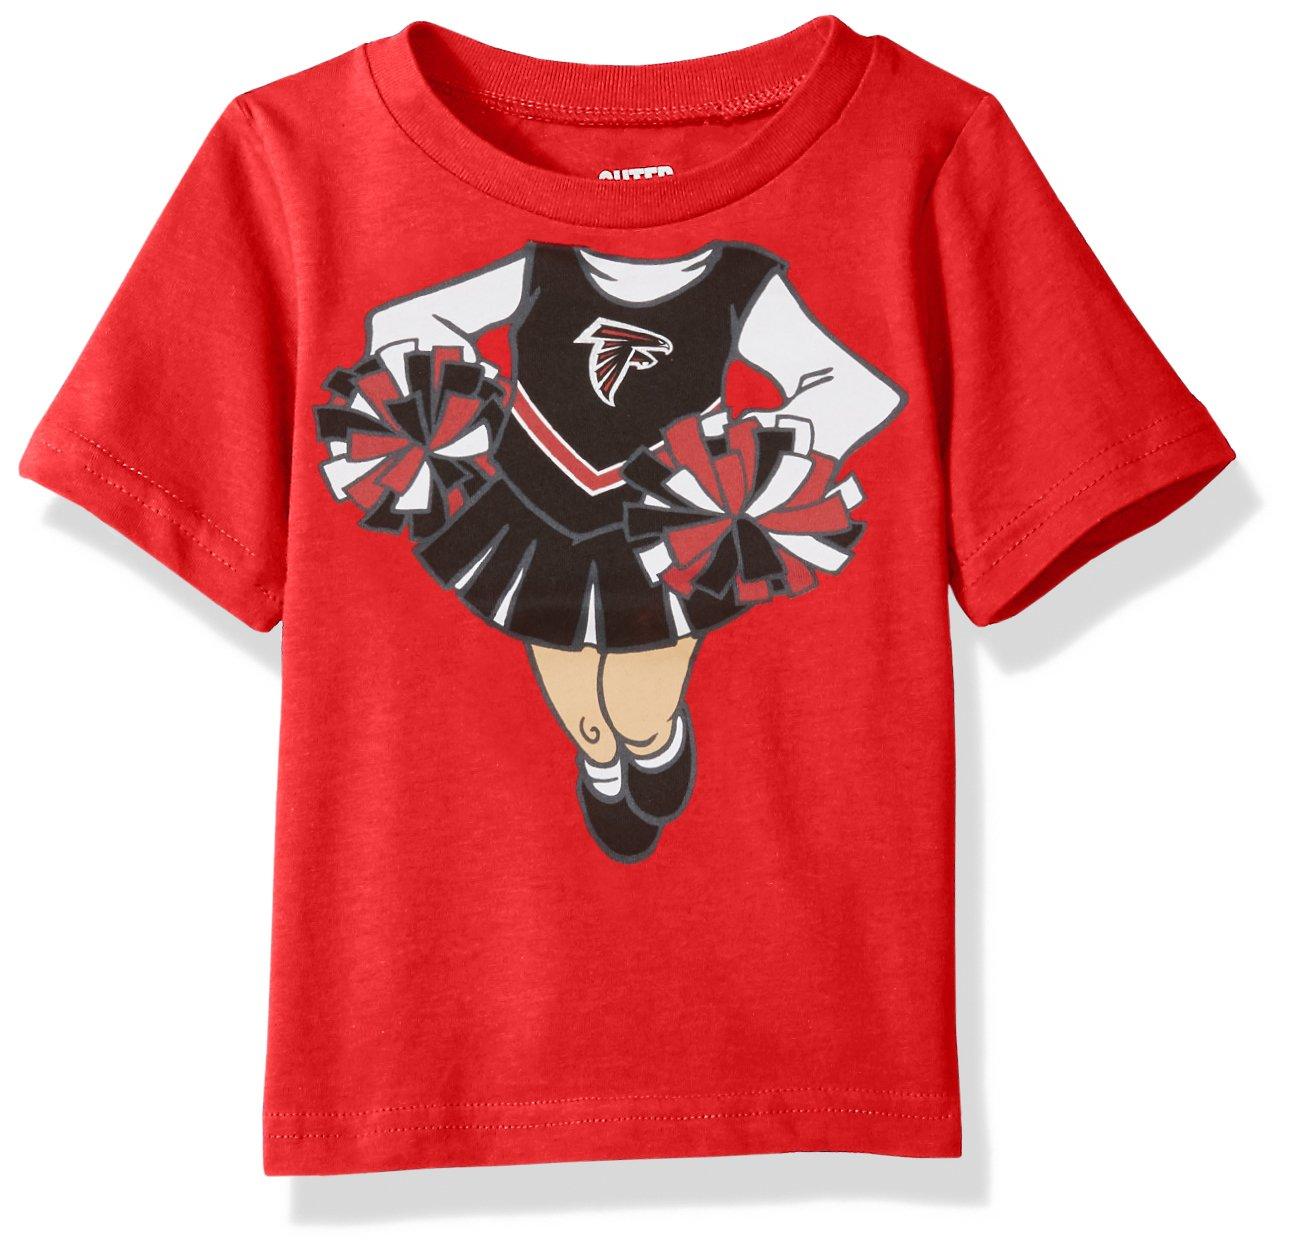 Outerstuff NFL Infant Dream Cheerleader Short Sleeve Tee